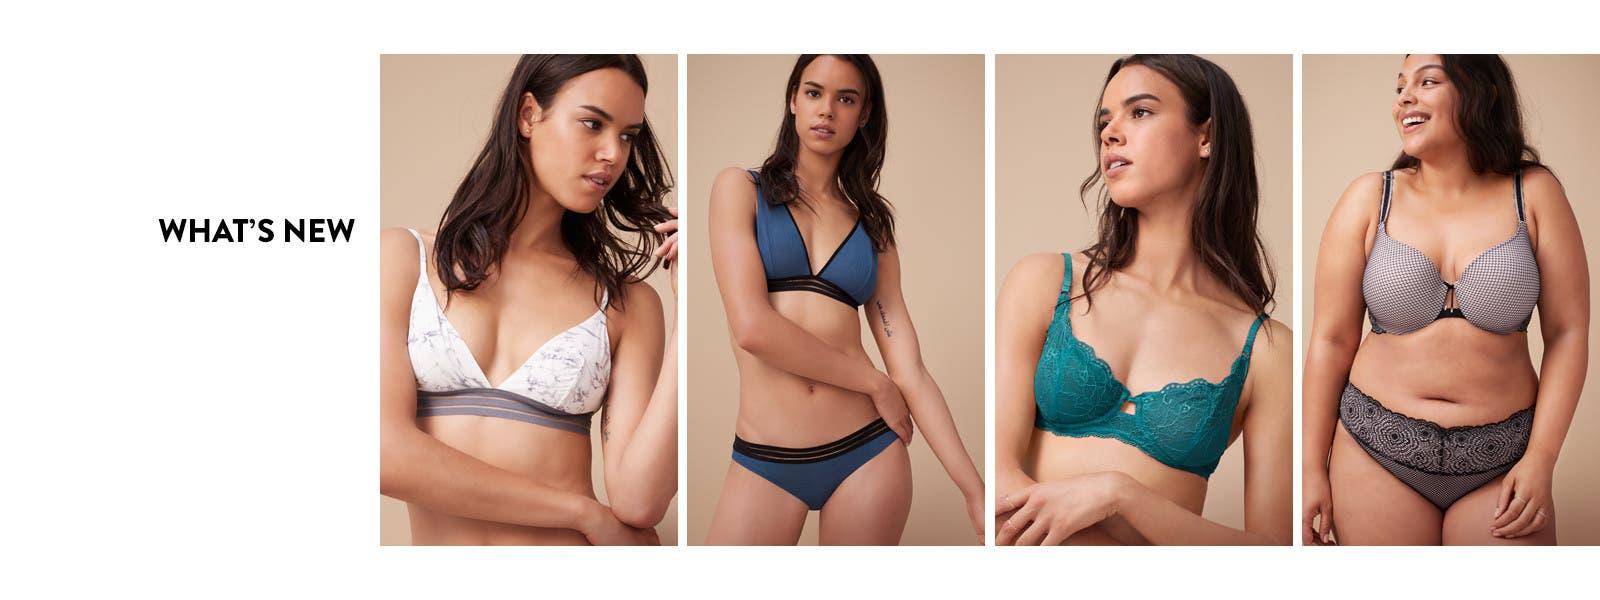 Women's Madewell Bras Lingerie & Underwear | Nordstrom